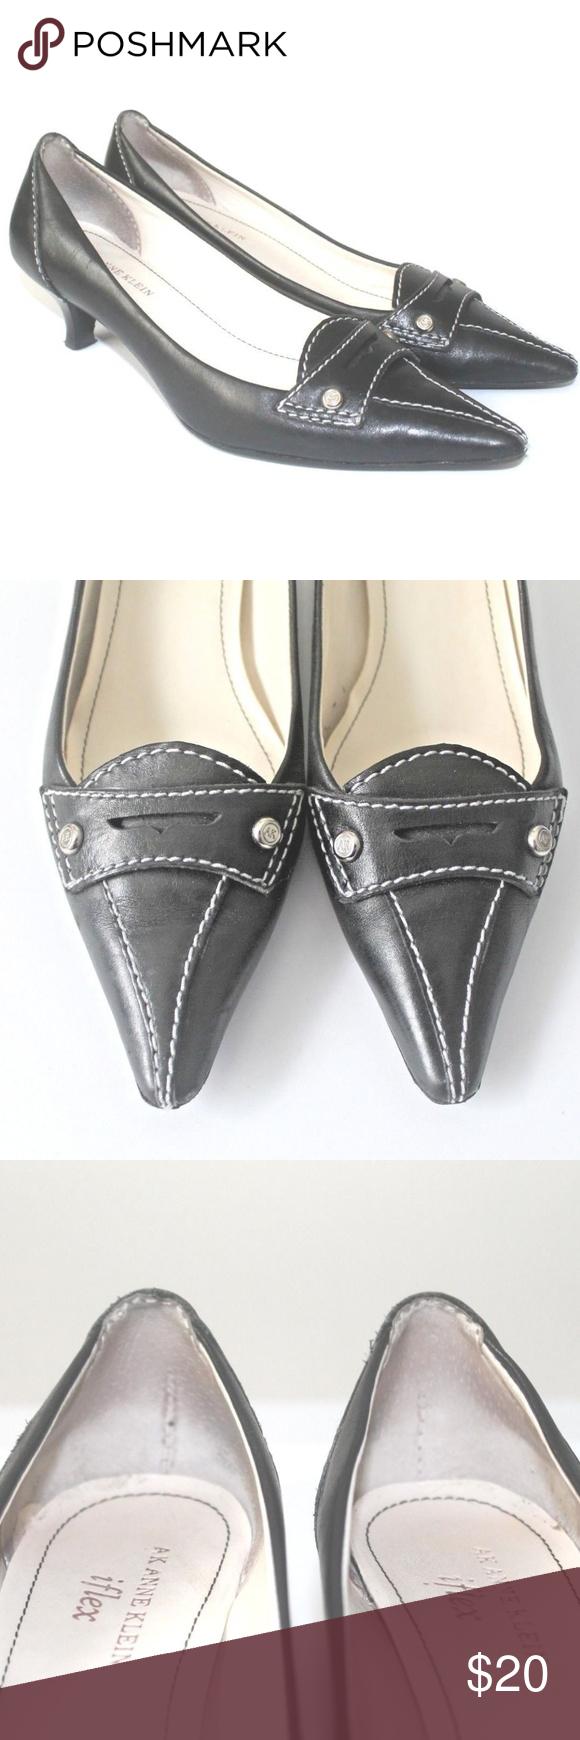 831e921259aa AK Anne Klein Iflex Black Kitten Heel Size 6M AK Anne Klein Iflex Black  Pointed Toe